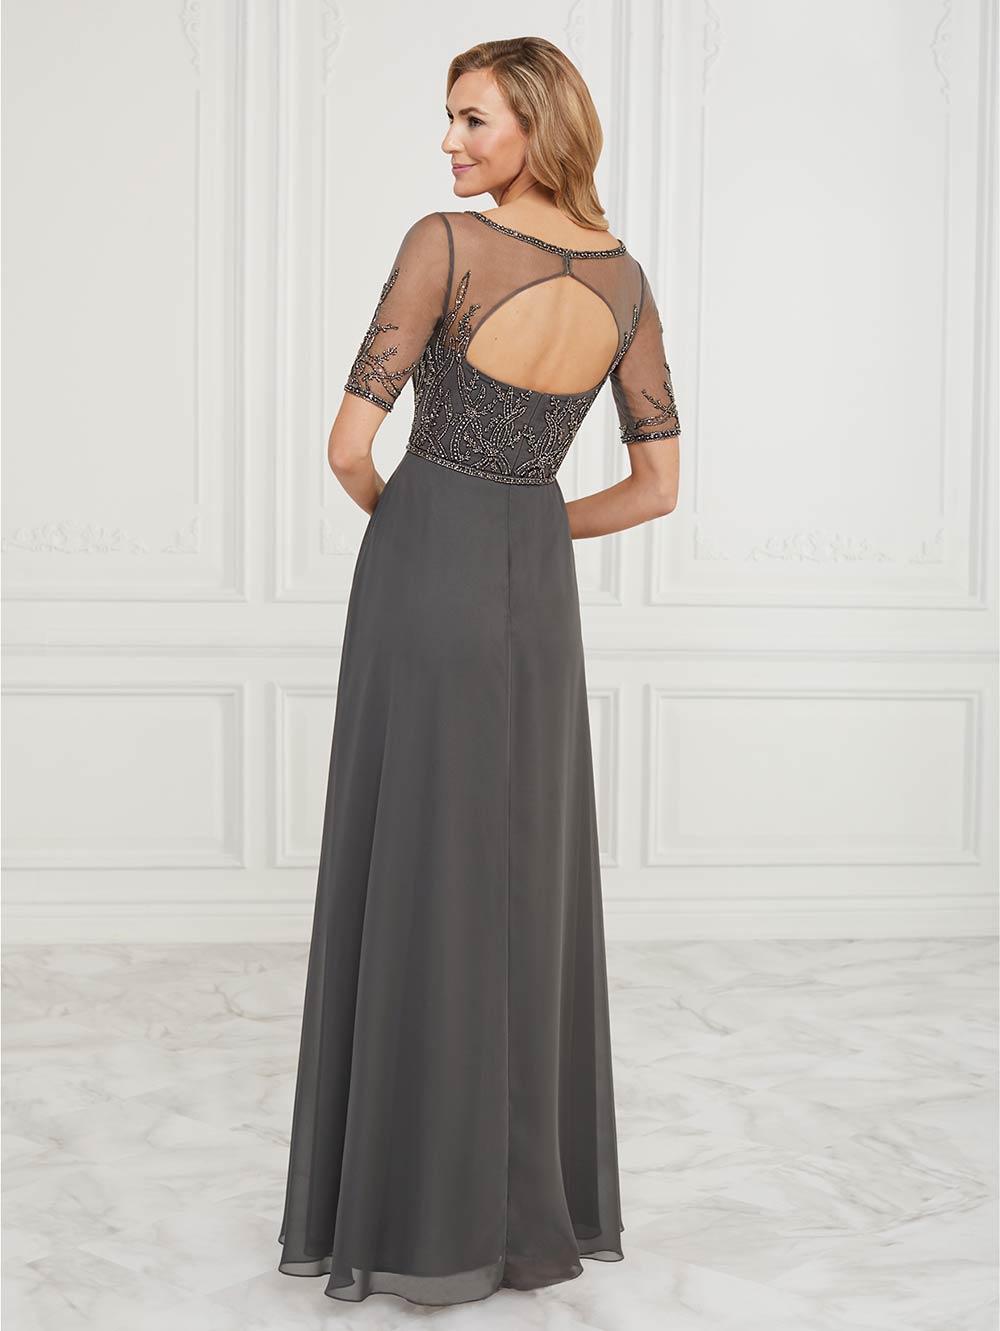 special-occasion-dresses-jacquelin-bridals-canada-27694